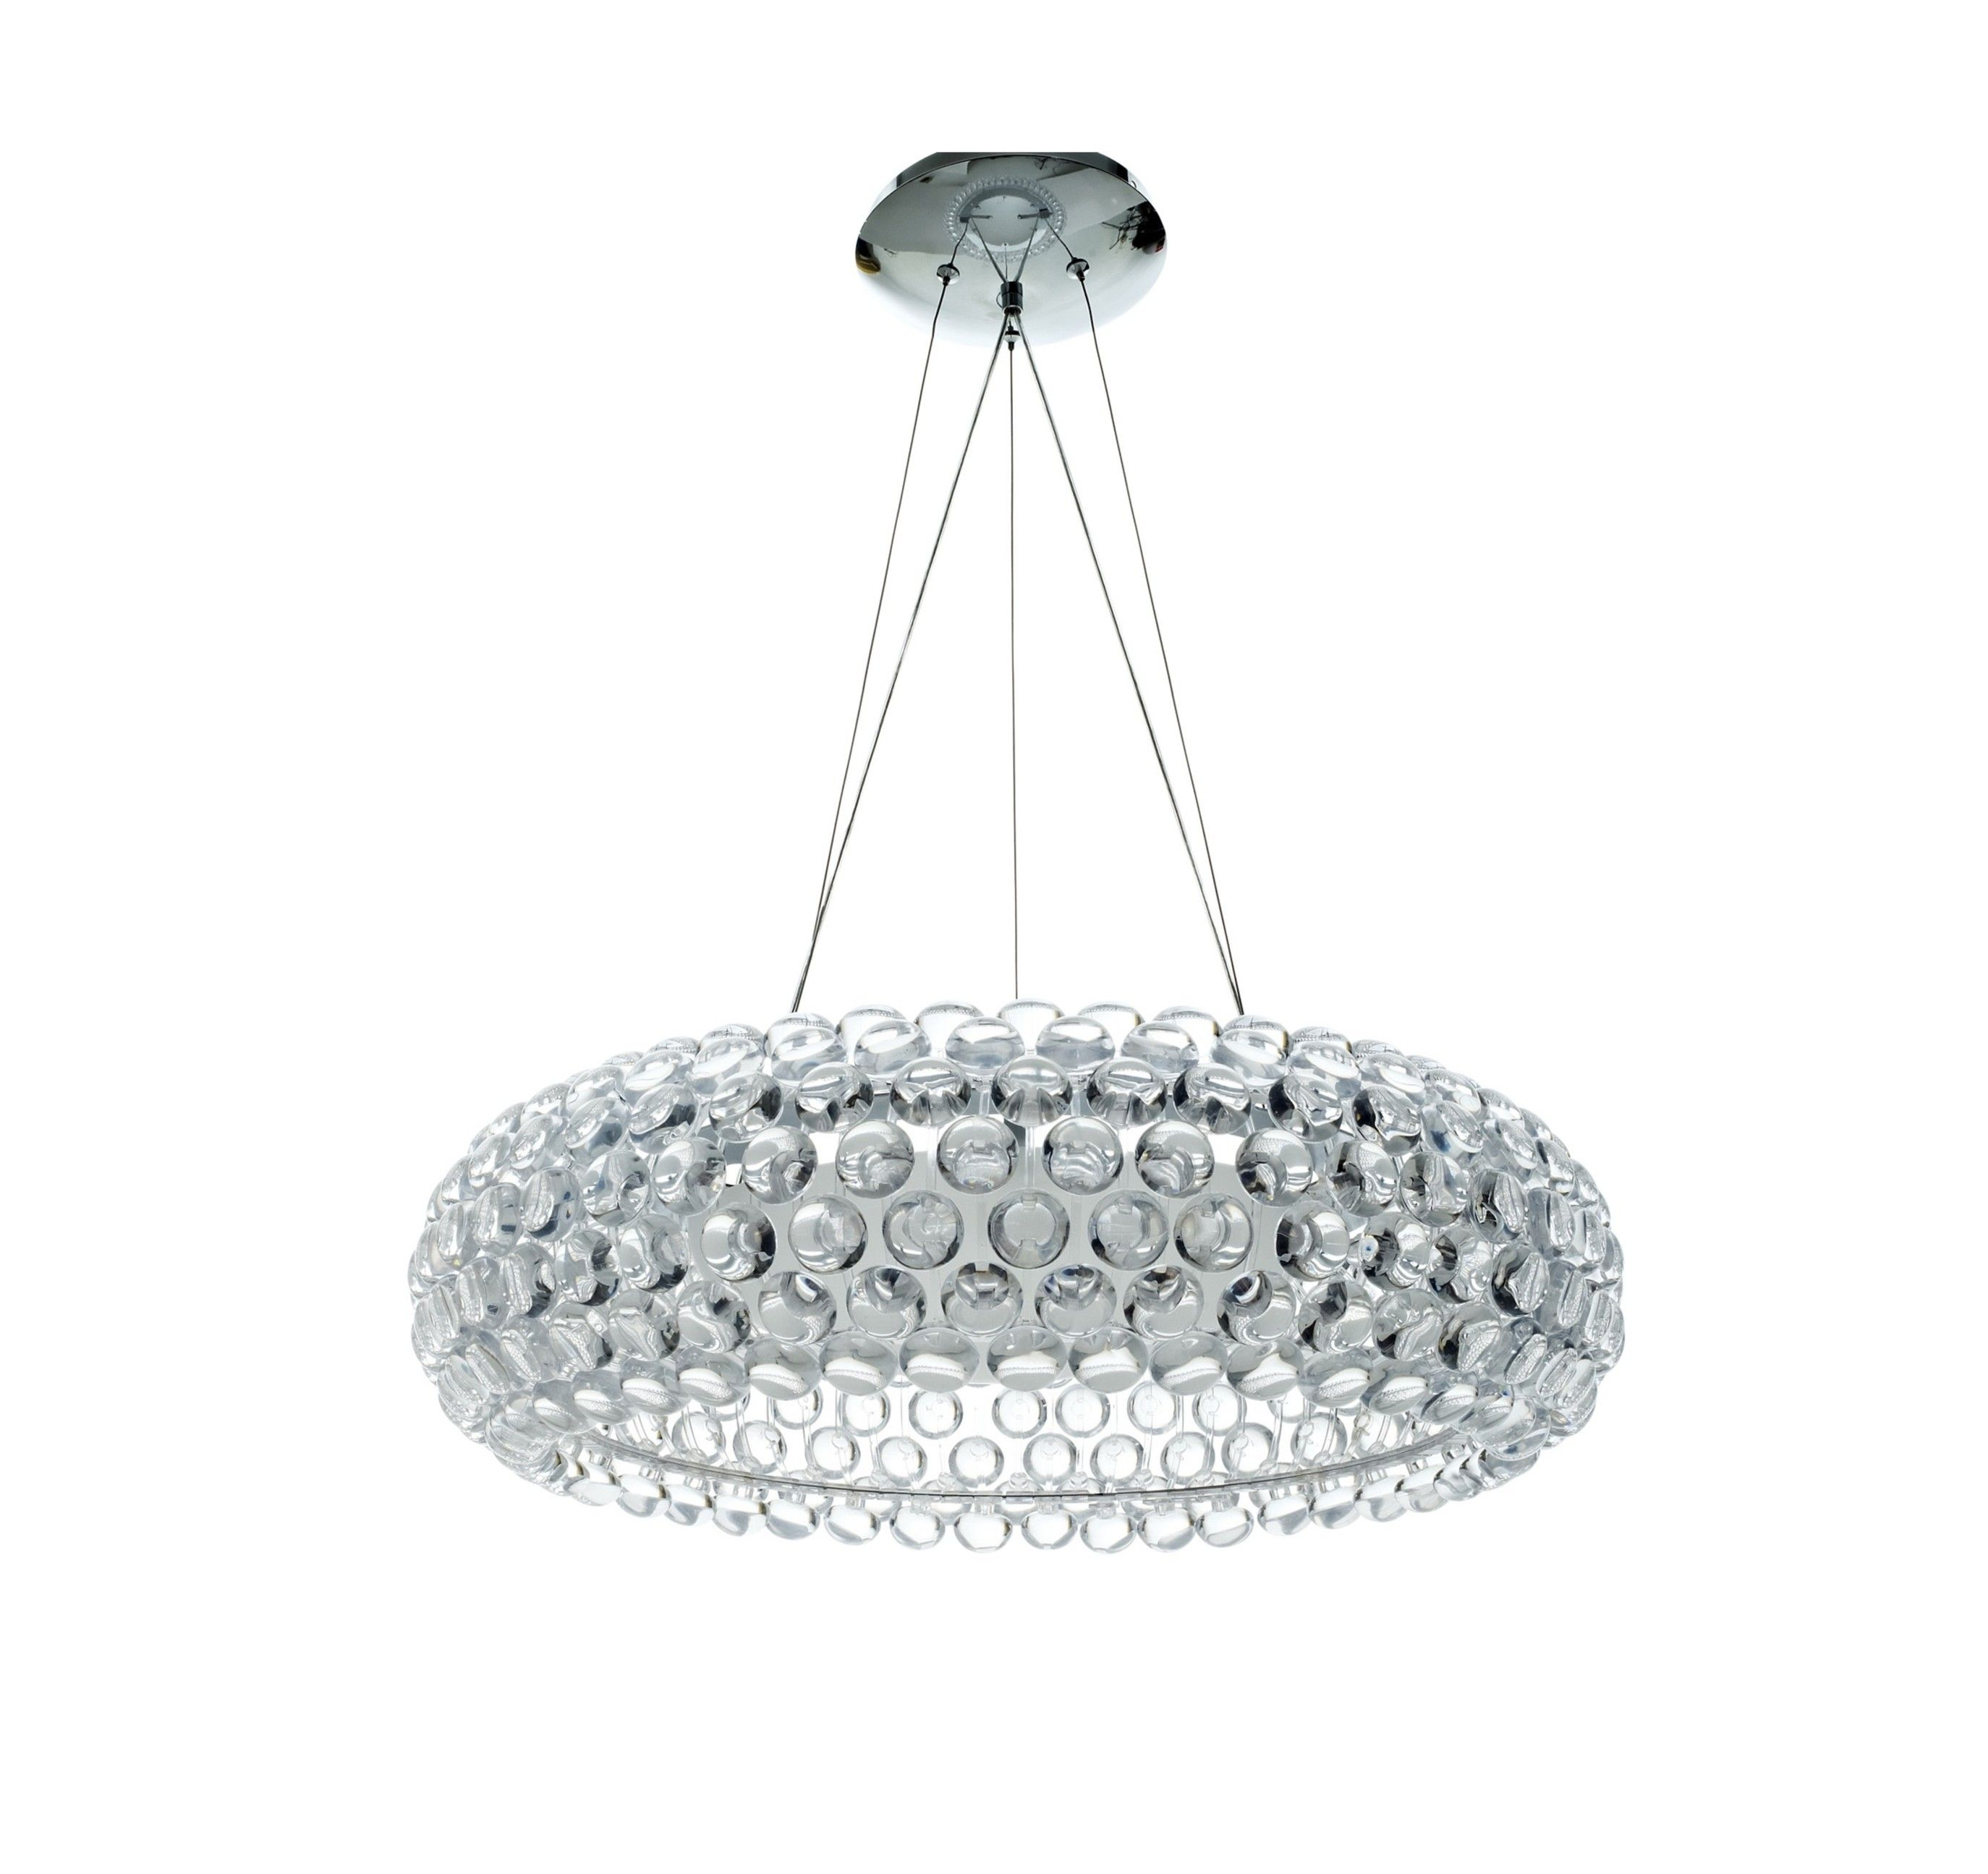 Decoration Ideas Stylish Round Modern Crystal Chandelier